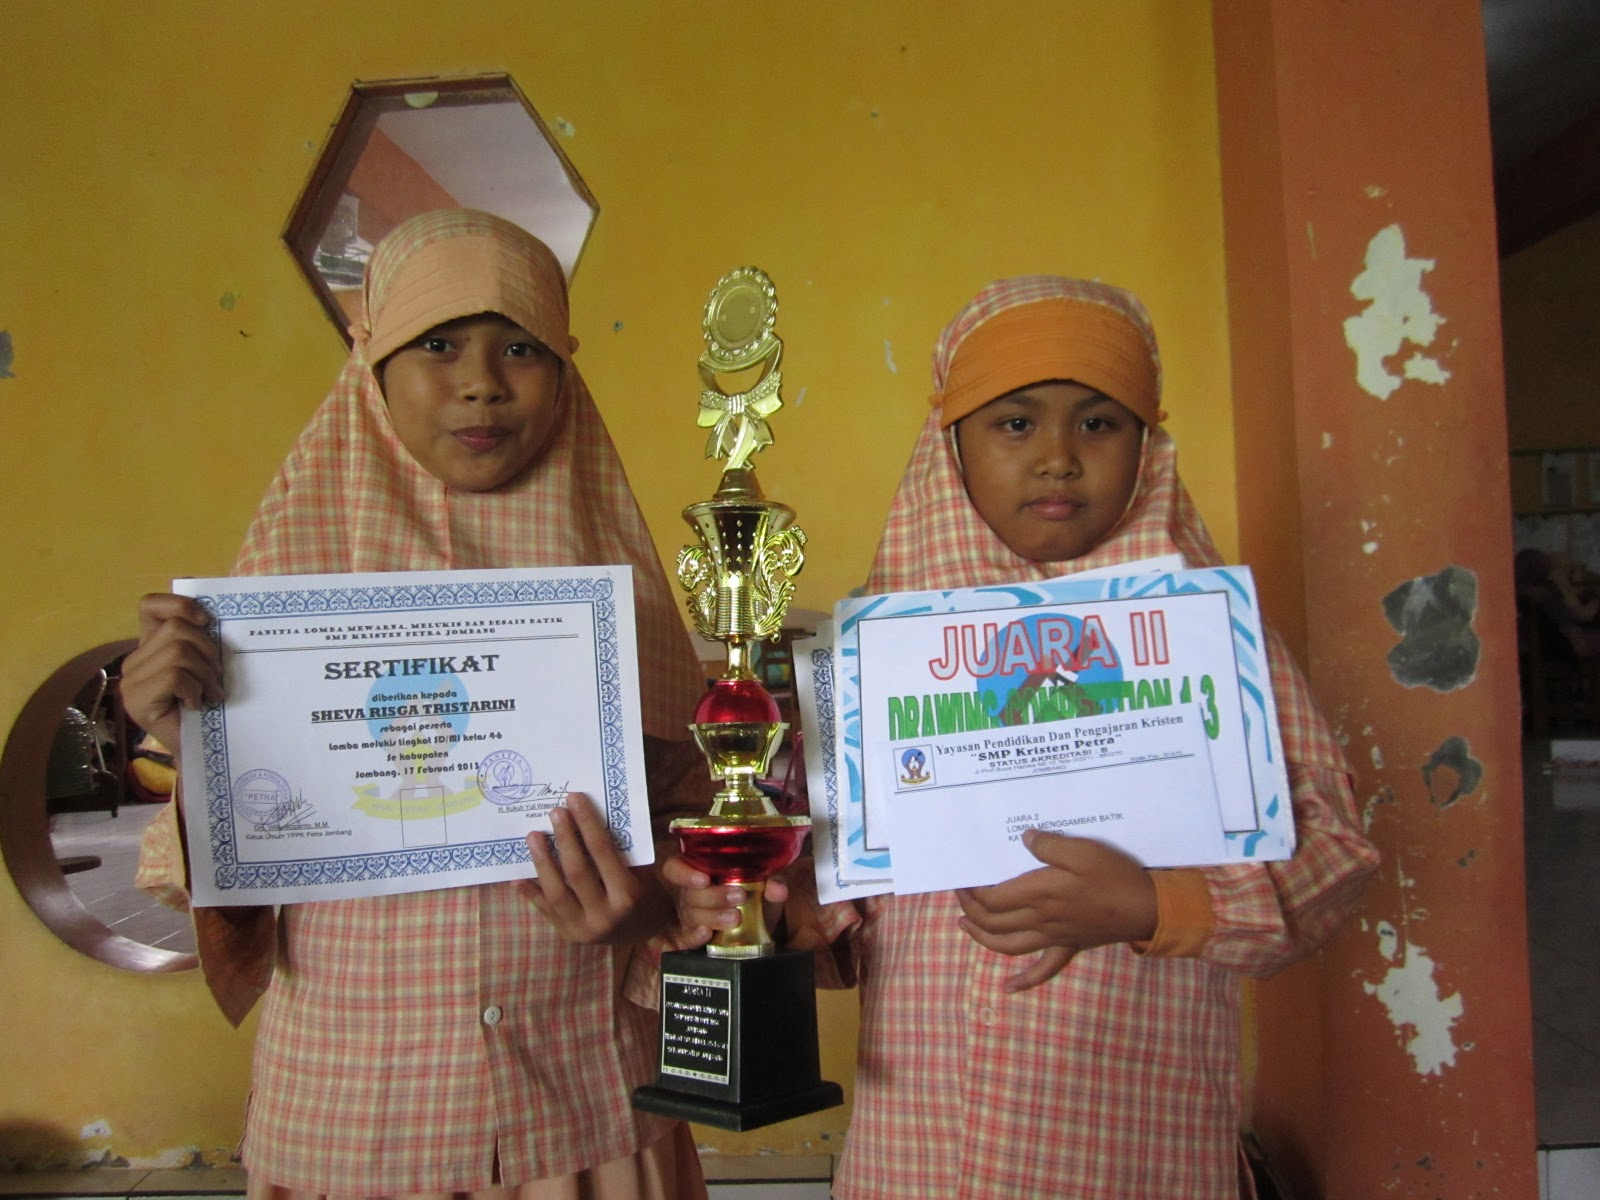 Siswi dari SD Ar-Rahman mendapatkan 'Juara II Lomba Melukis tingkat SD se-Kabupaten Jombang'